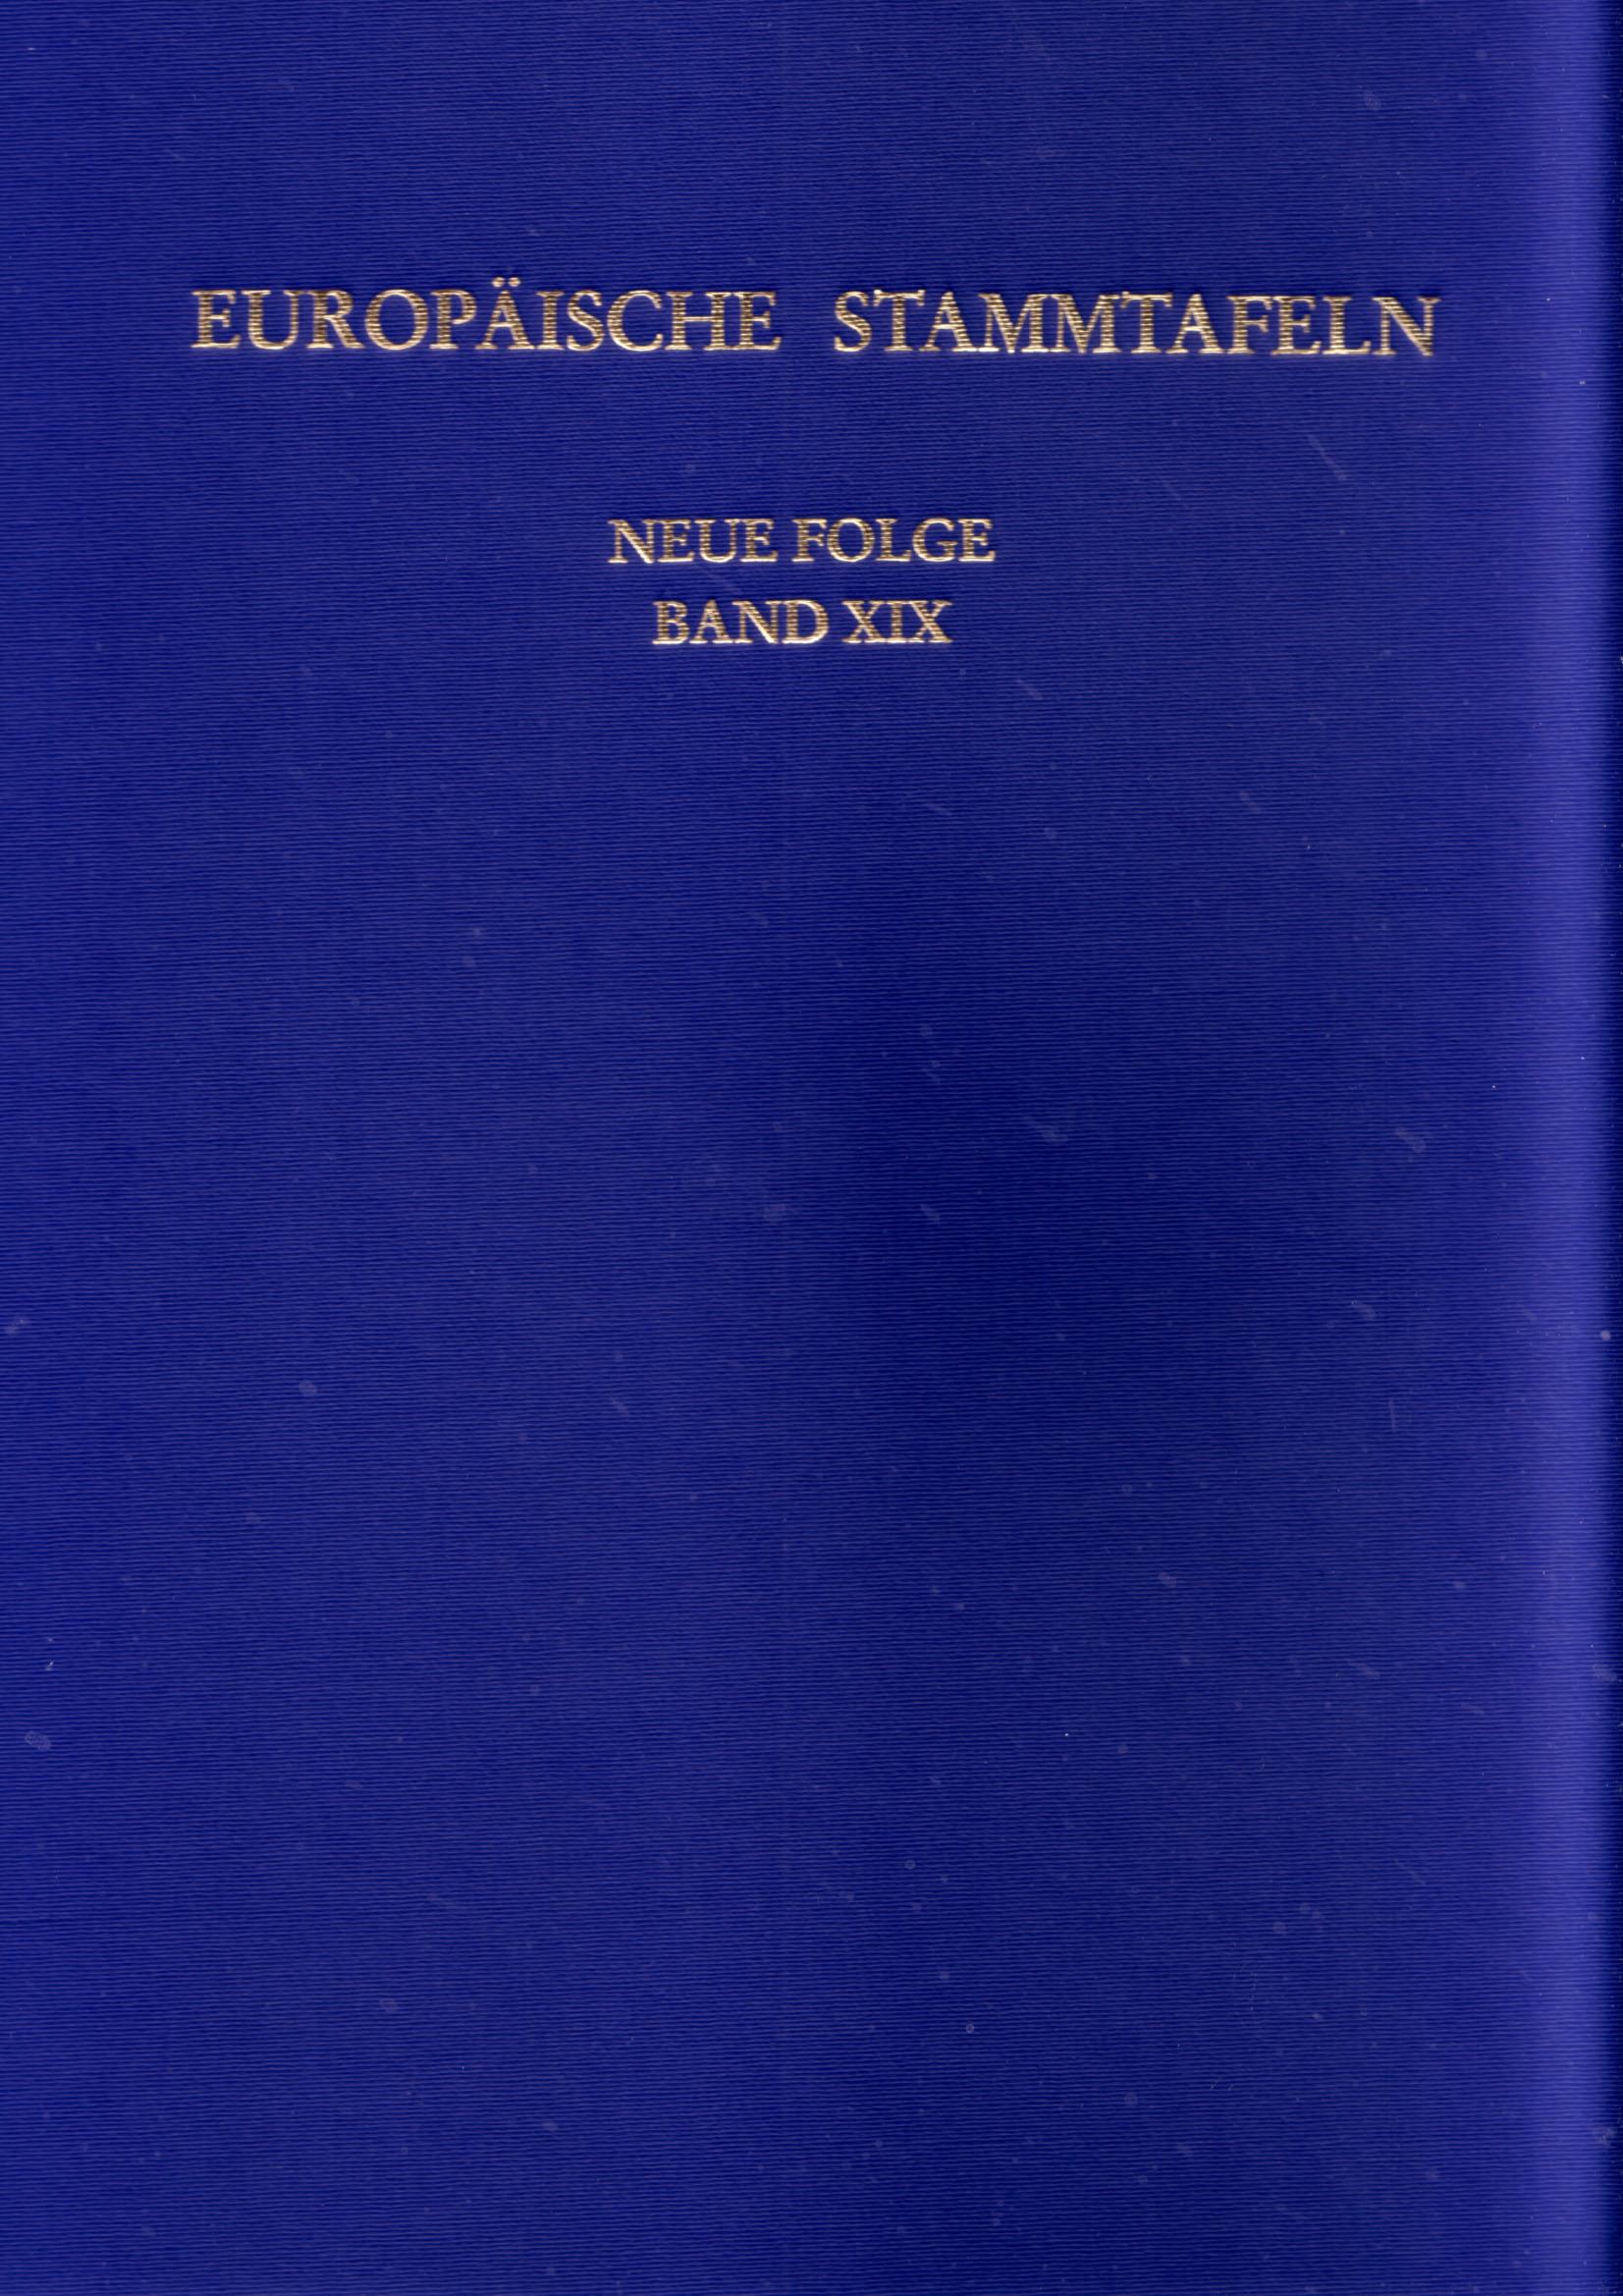 Europäische Stammtafeln. Neue Folge Band XIX